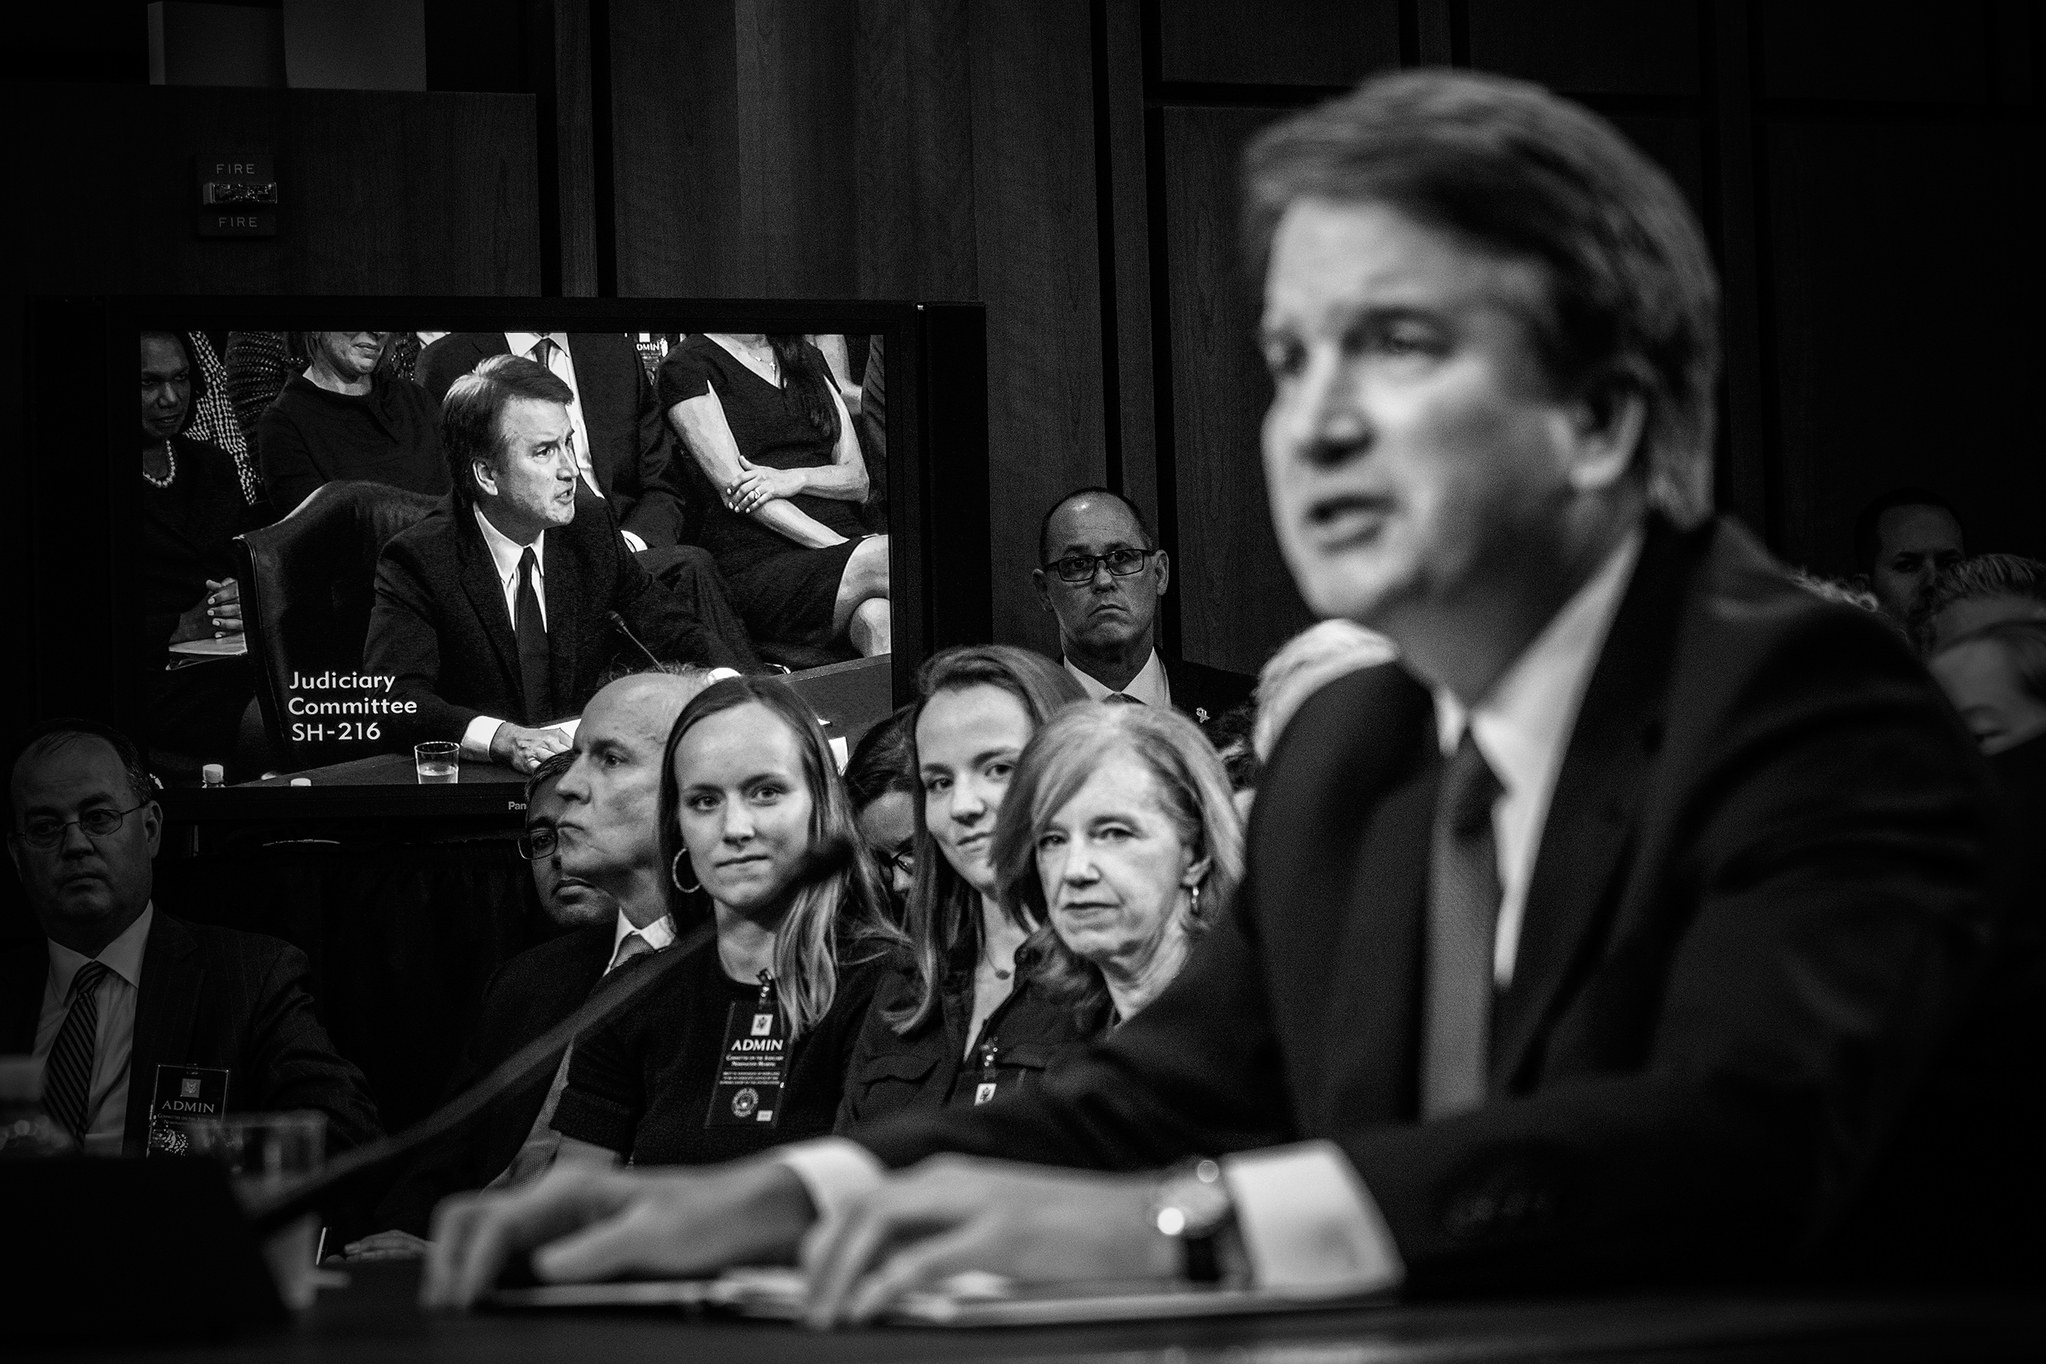 Brett Kavanaugh in Senate Confirmation hearing. Photo:  Mark Peterson / Redux for The New Yorker